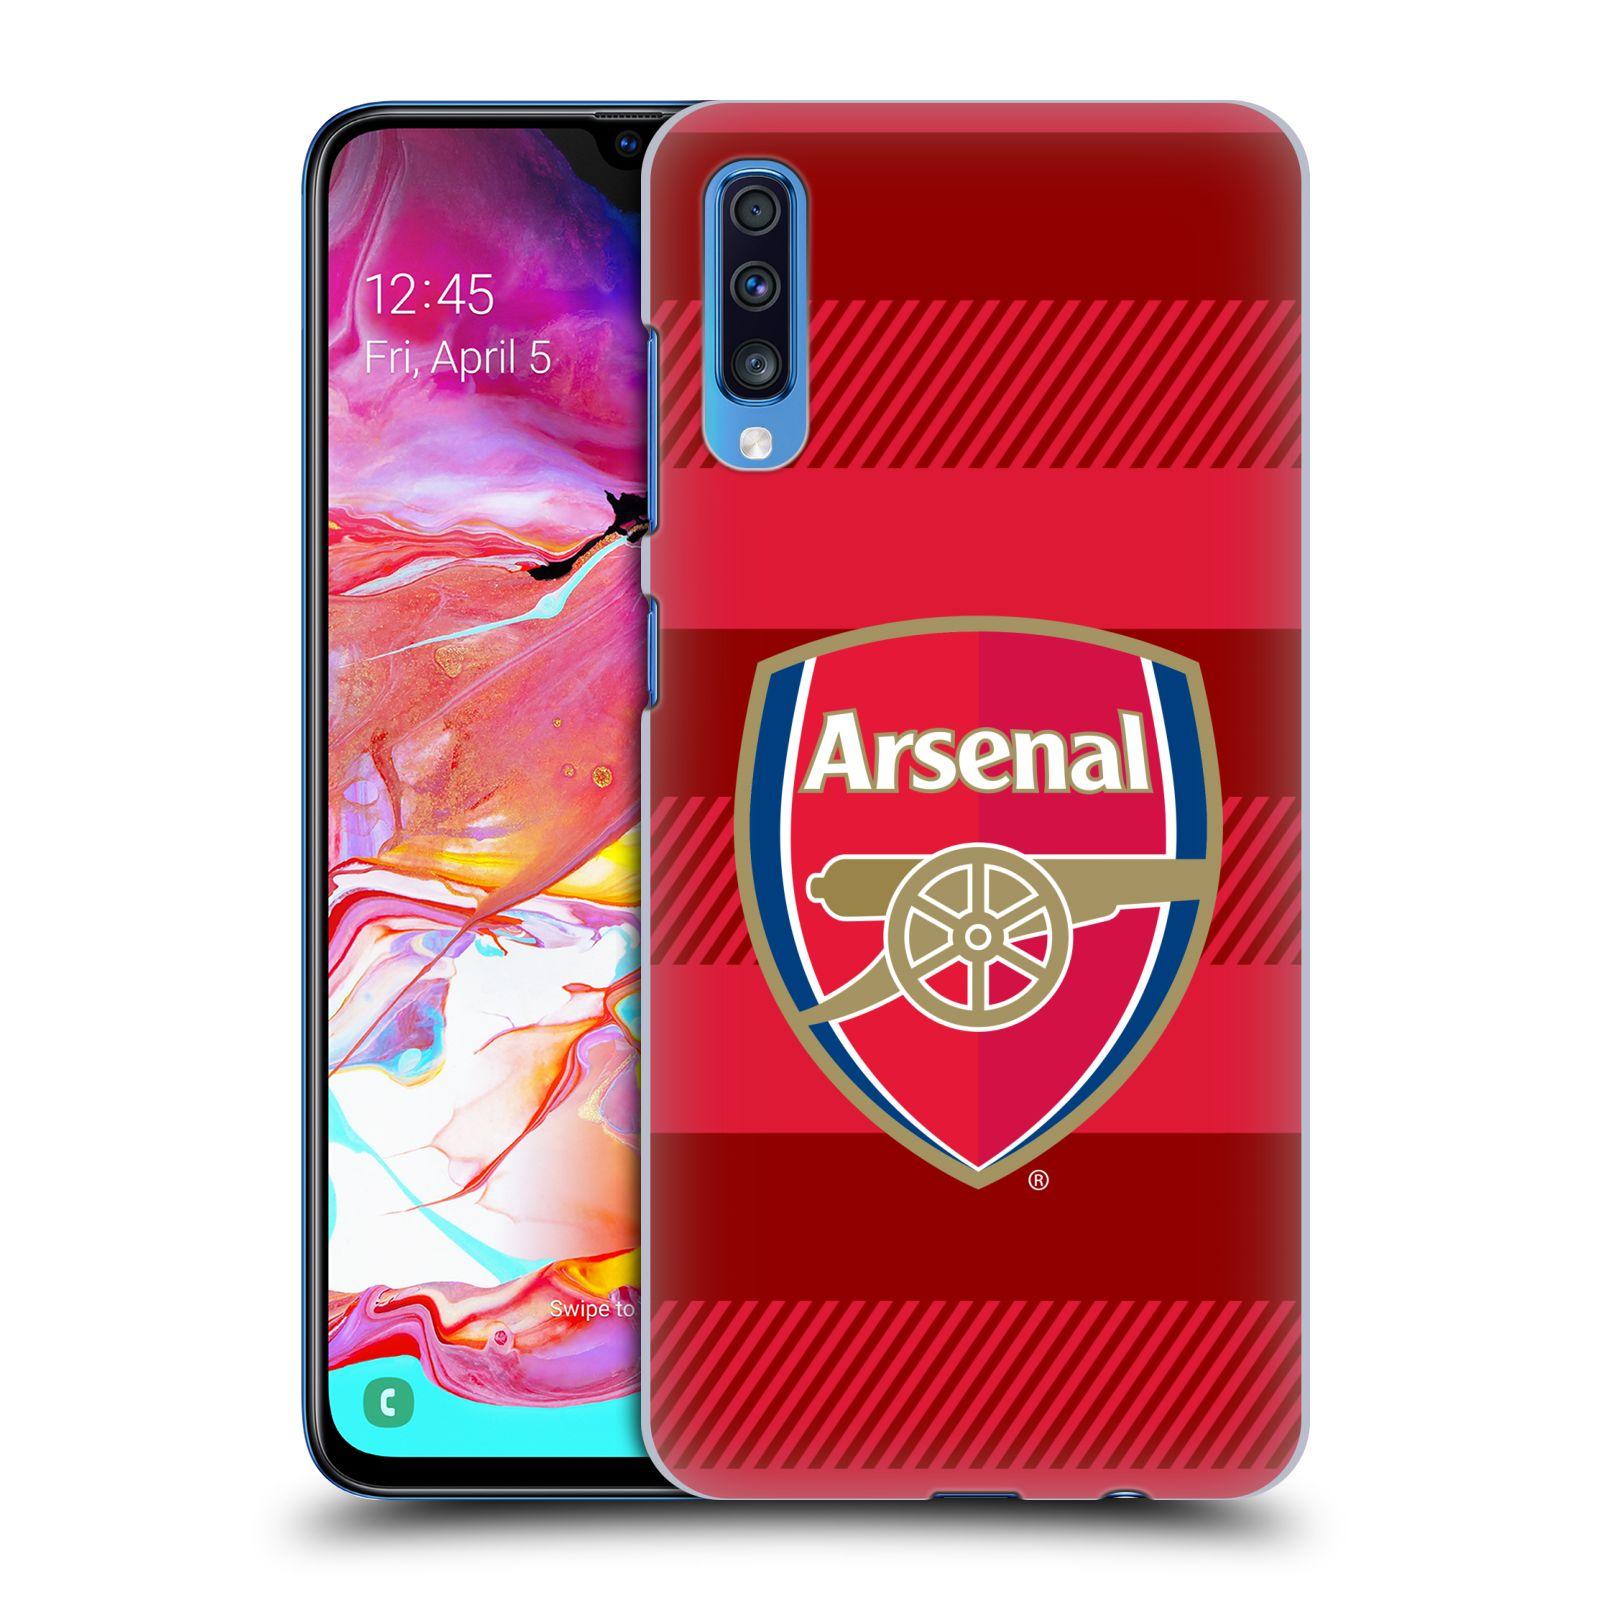 Plastové pouzdro na mobil Samsung Galaxy A70 - Head Case - Arsenal FC - Logo s pruhy